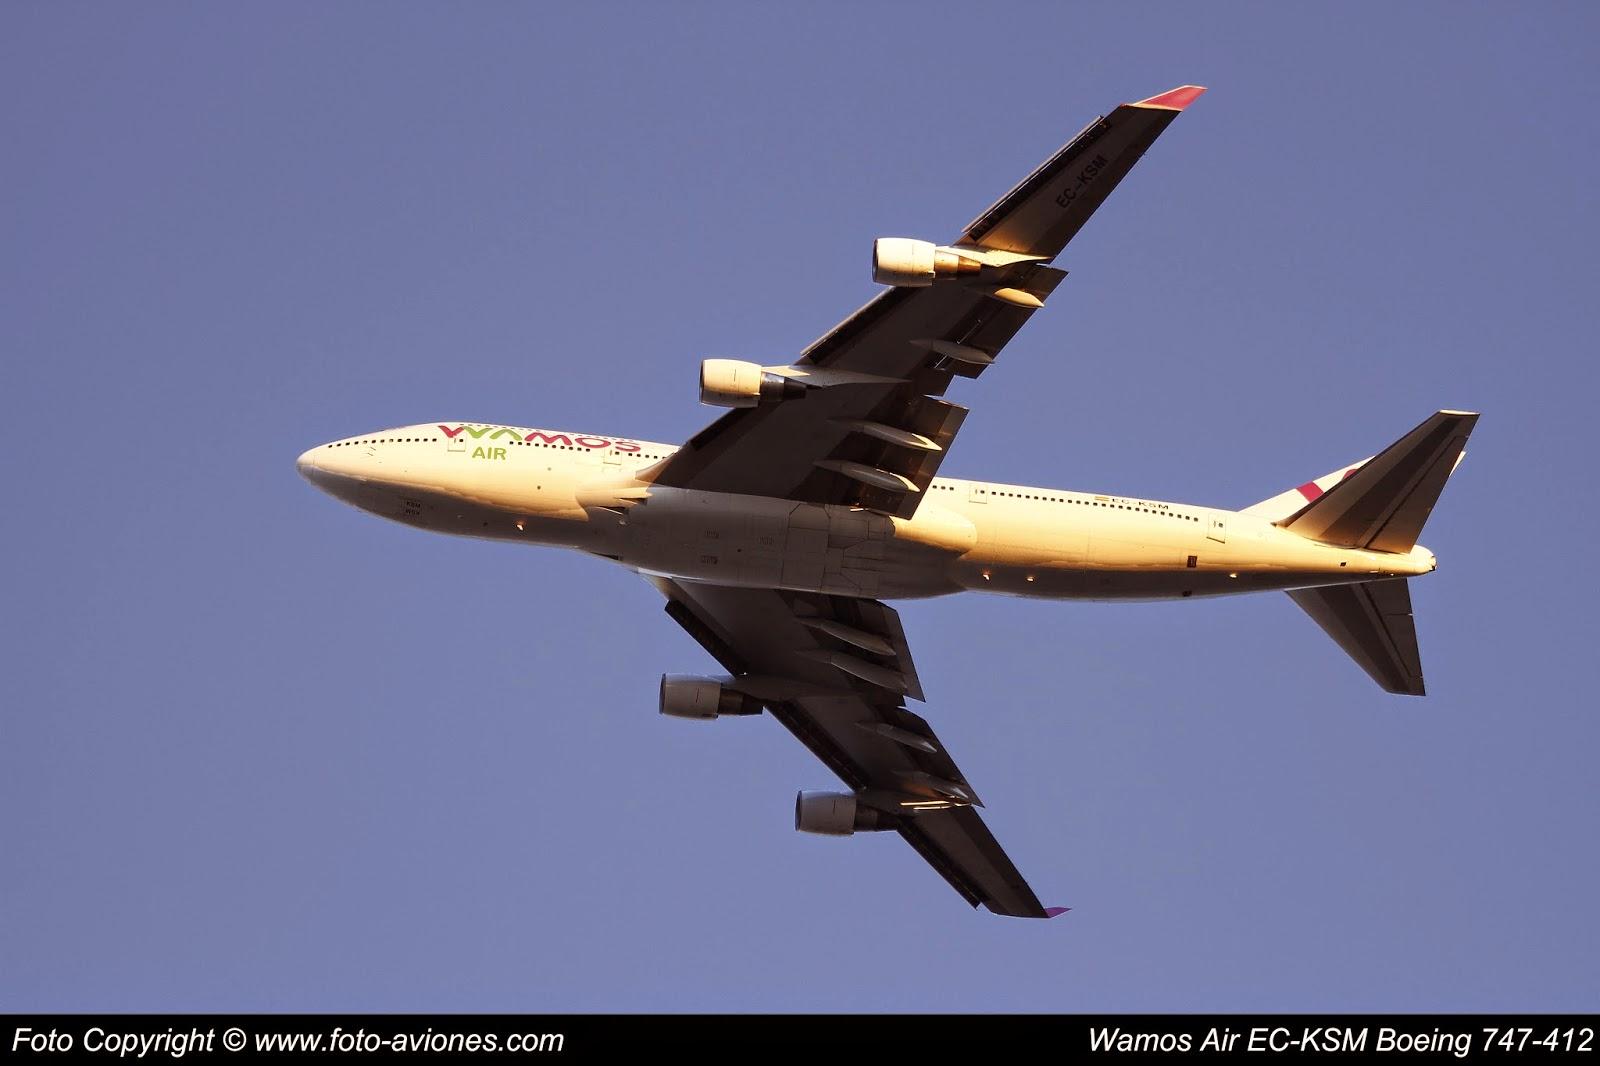 Boeing 747 / EC-KSM